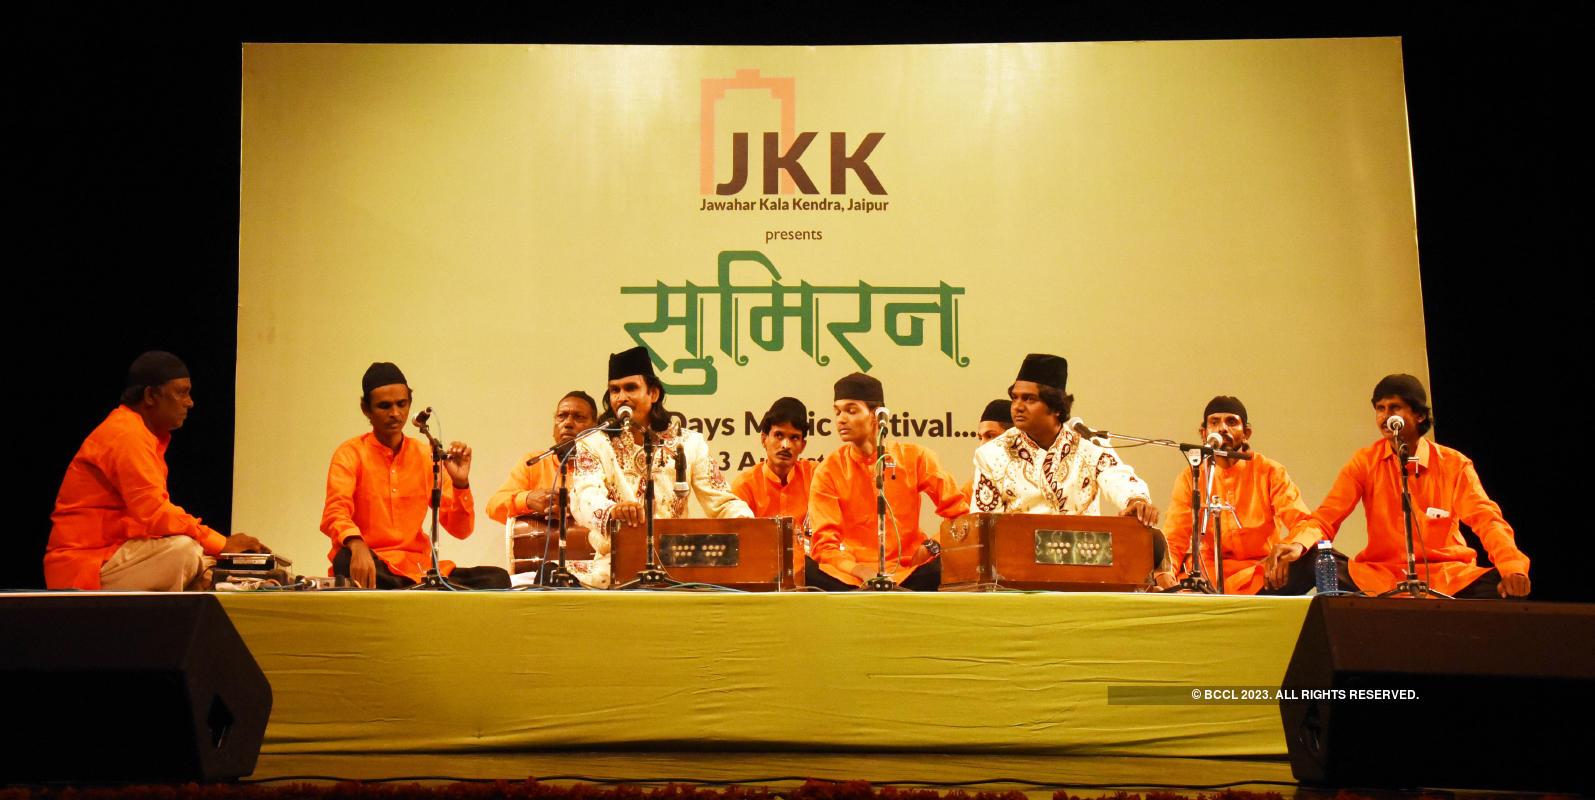 Haveli sangeet enchants Jaipurites